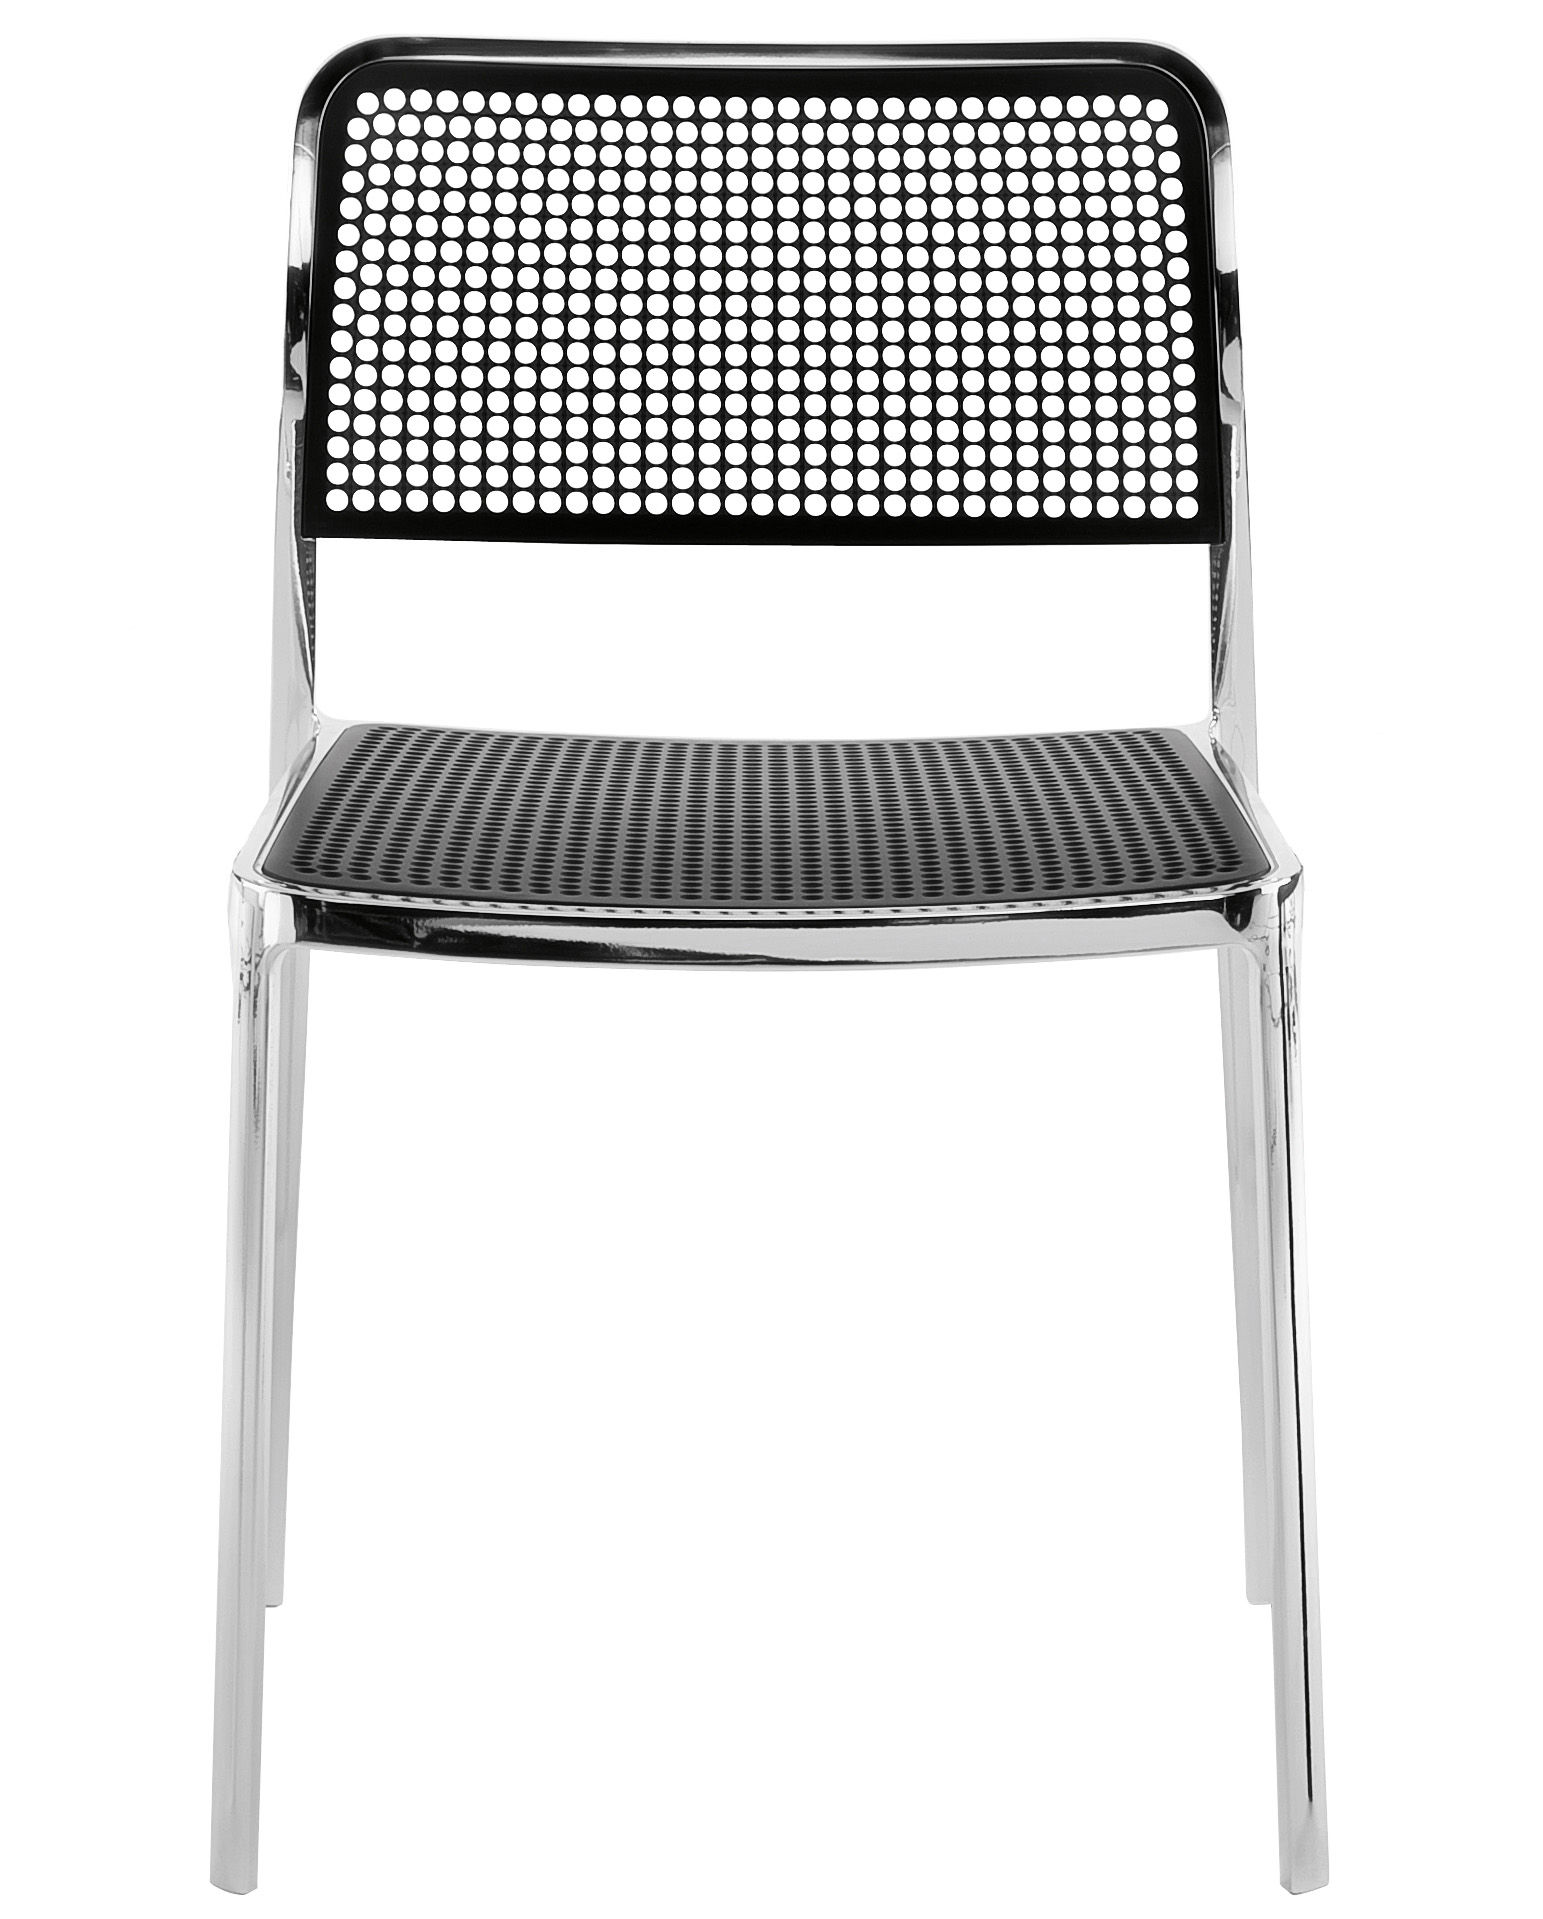 chaise empilable audrey structure aluminium brillant structure alu brillant assise noire. Black Bedroom Furniture Sets. Home Design Ideas